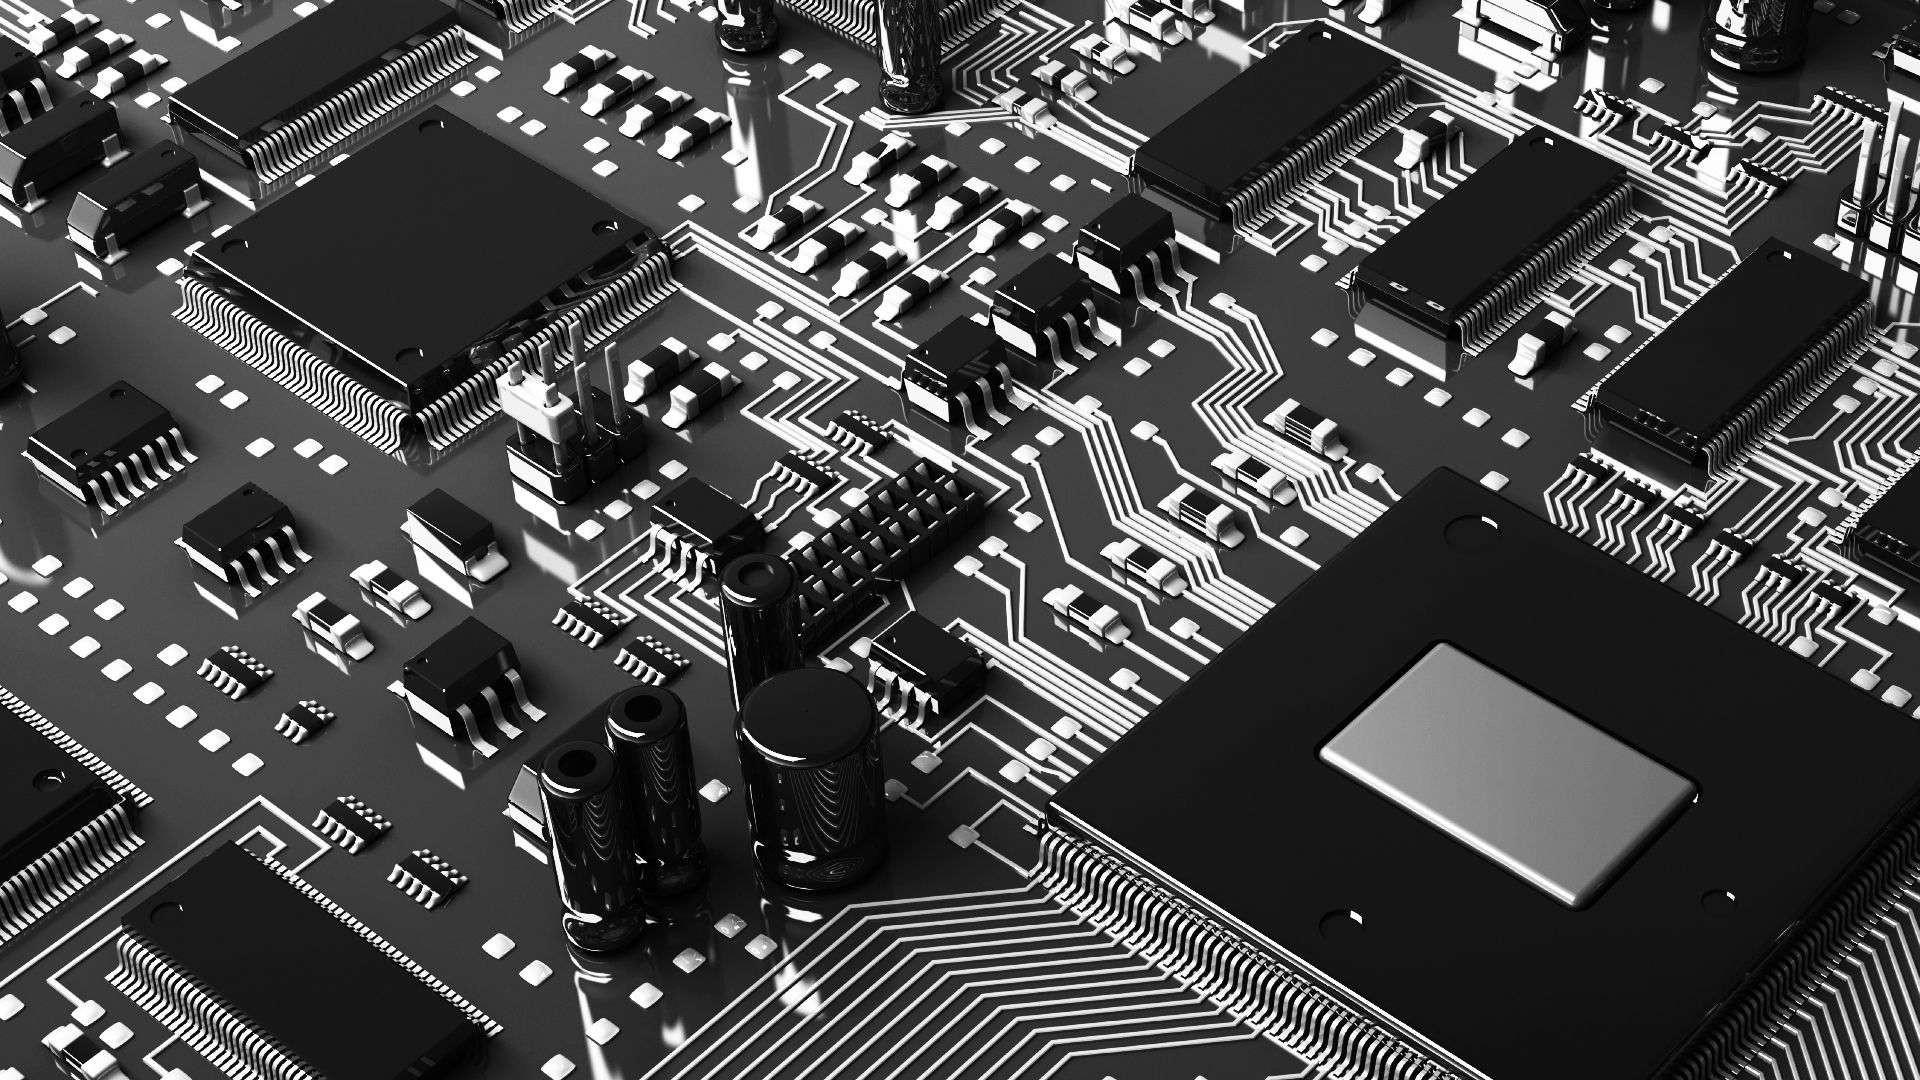 Circuitboard HD Wallpaper » FullHDWpp – Full HD Wallpapers 1920×1080